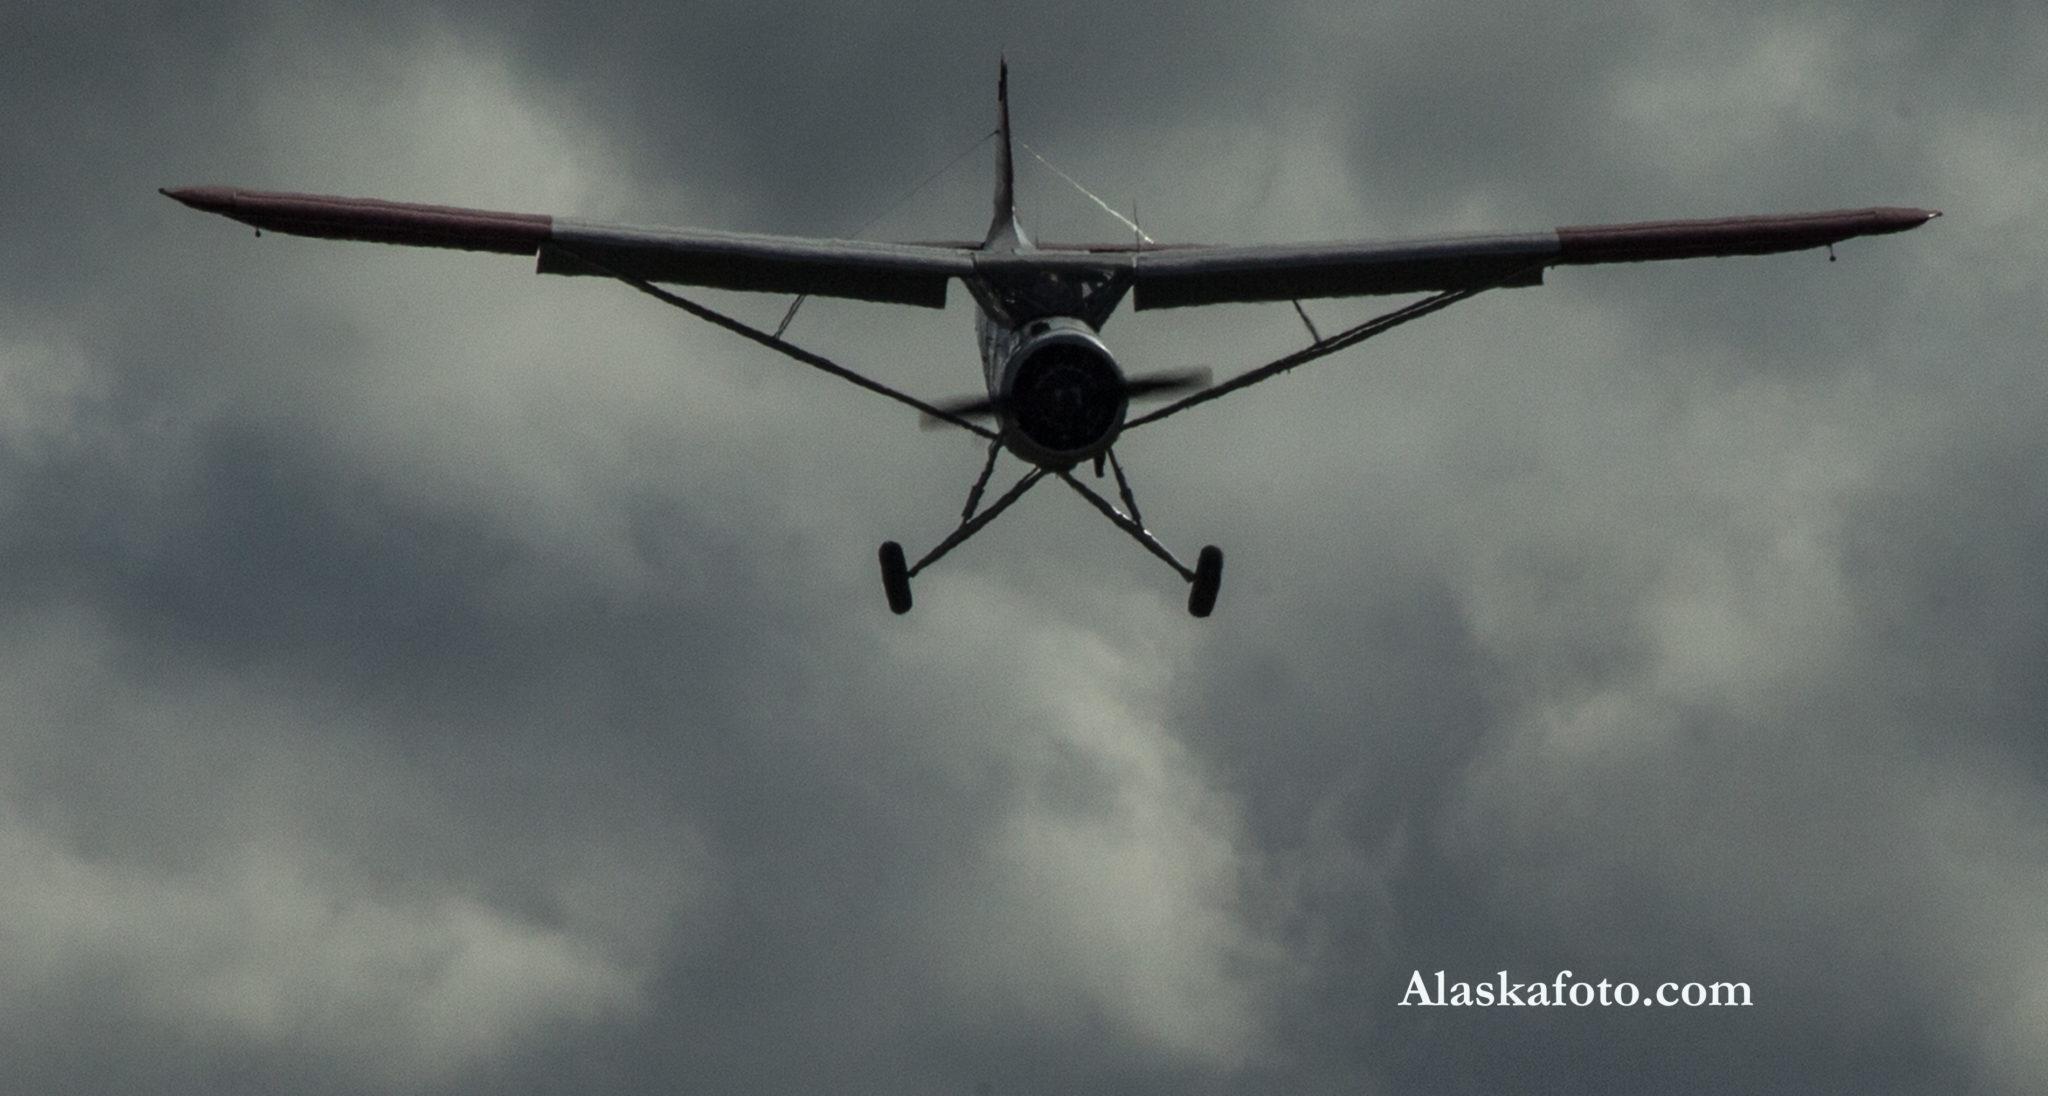 alaska air cargo, -airplane photographer